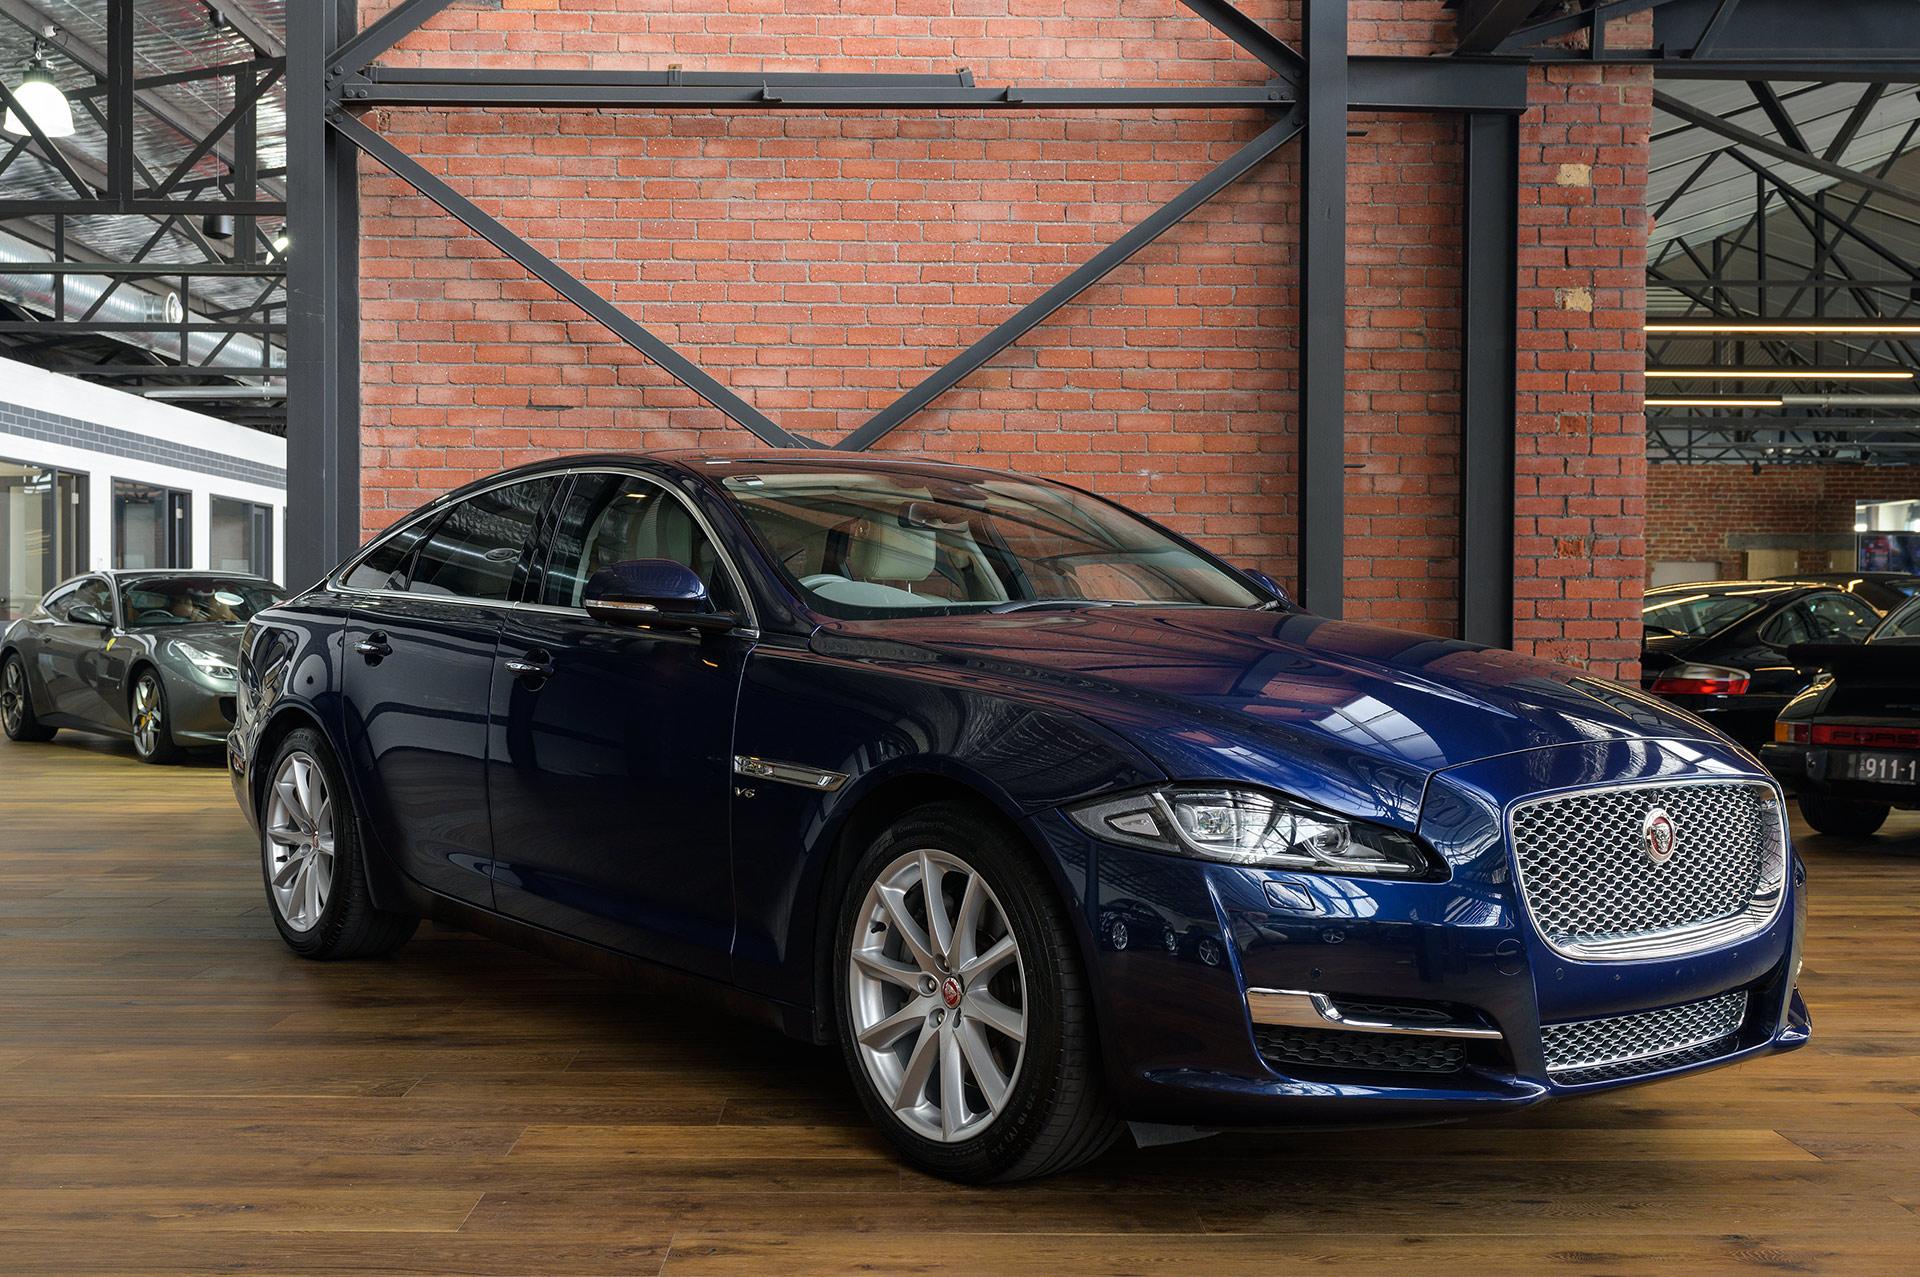 2016 Jaguar XJ X351 Premium Luxury Sedan - Richmonds - Classic and Prestige Cars - Storage and ...